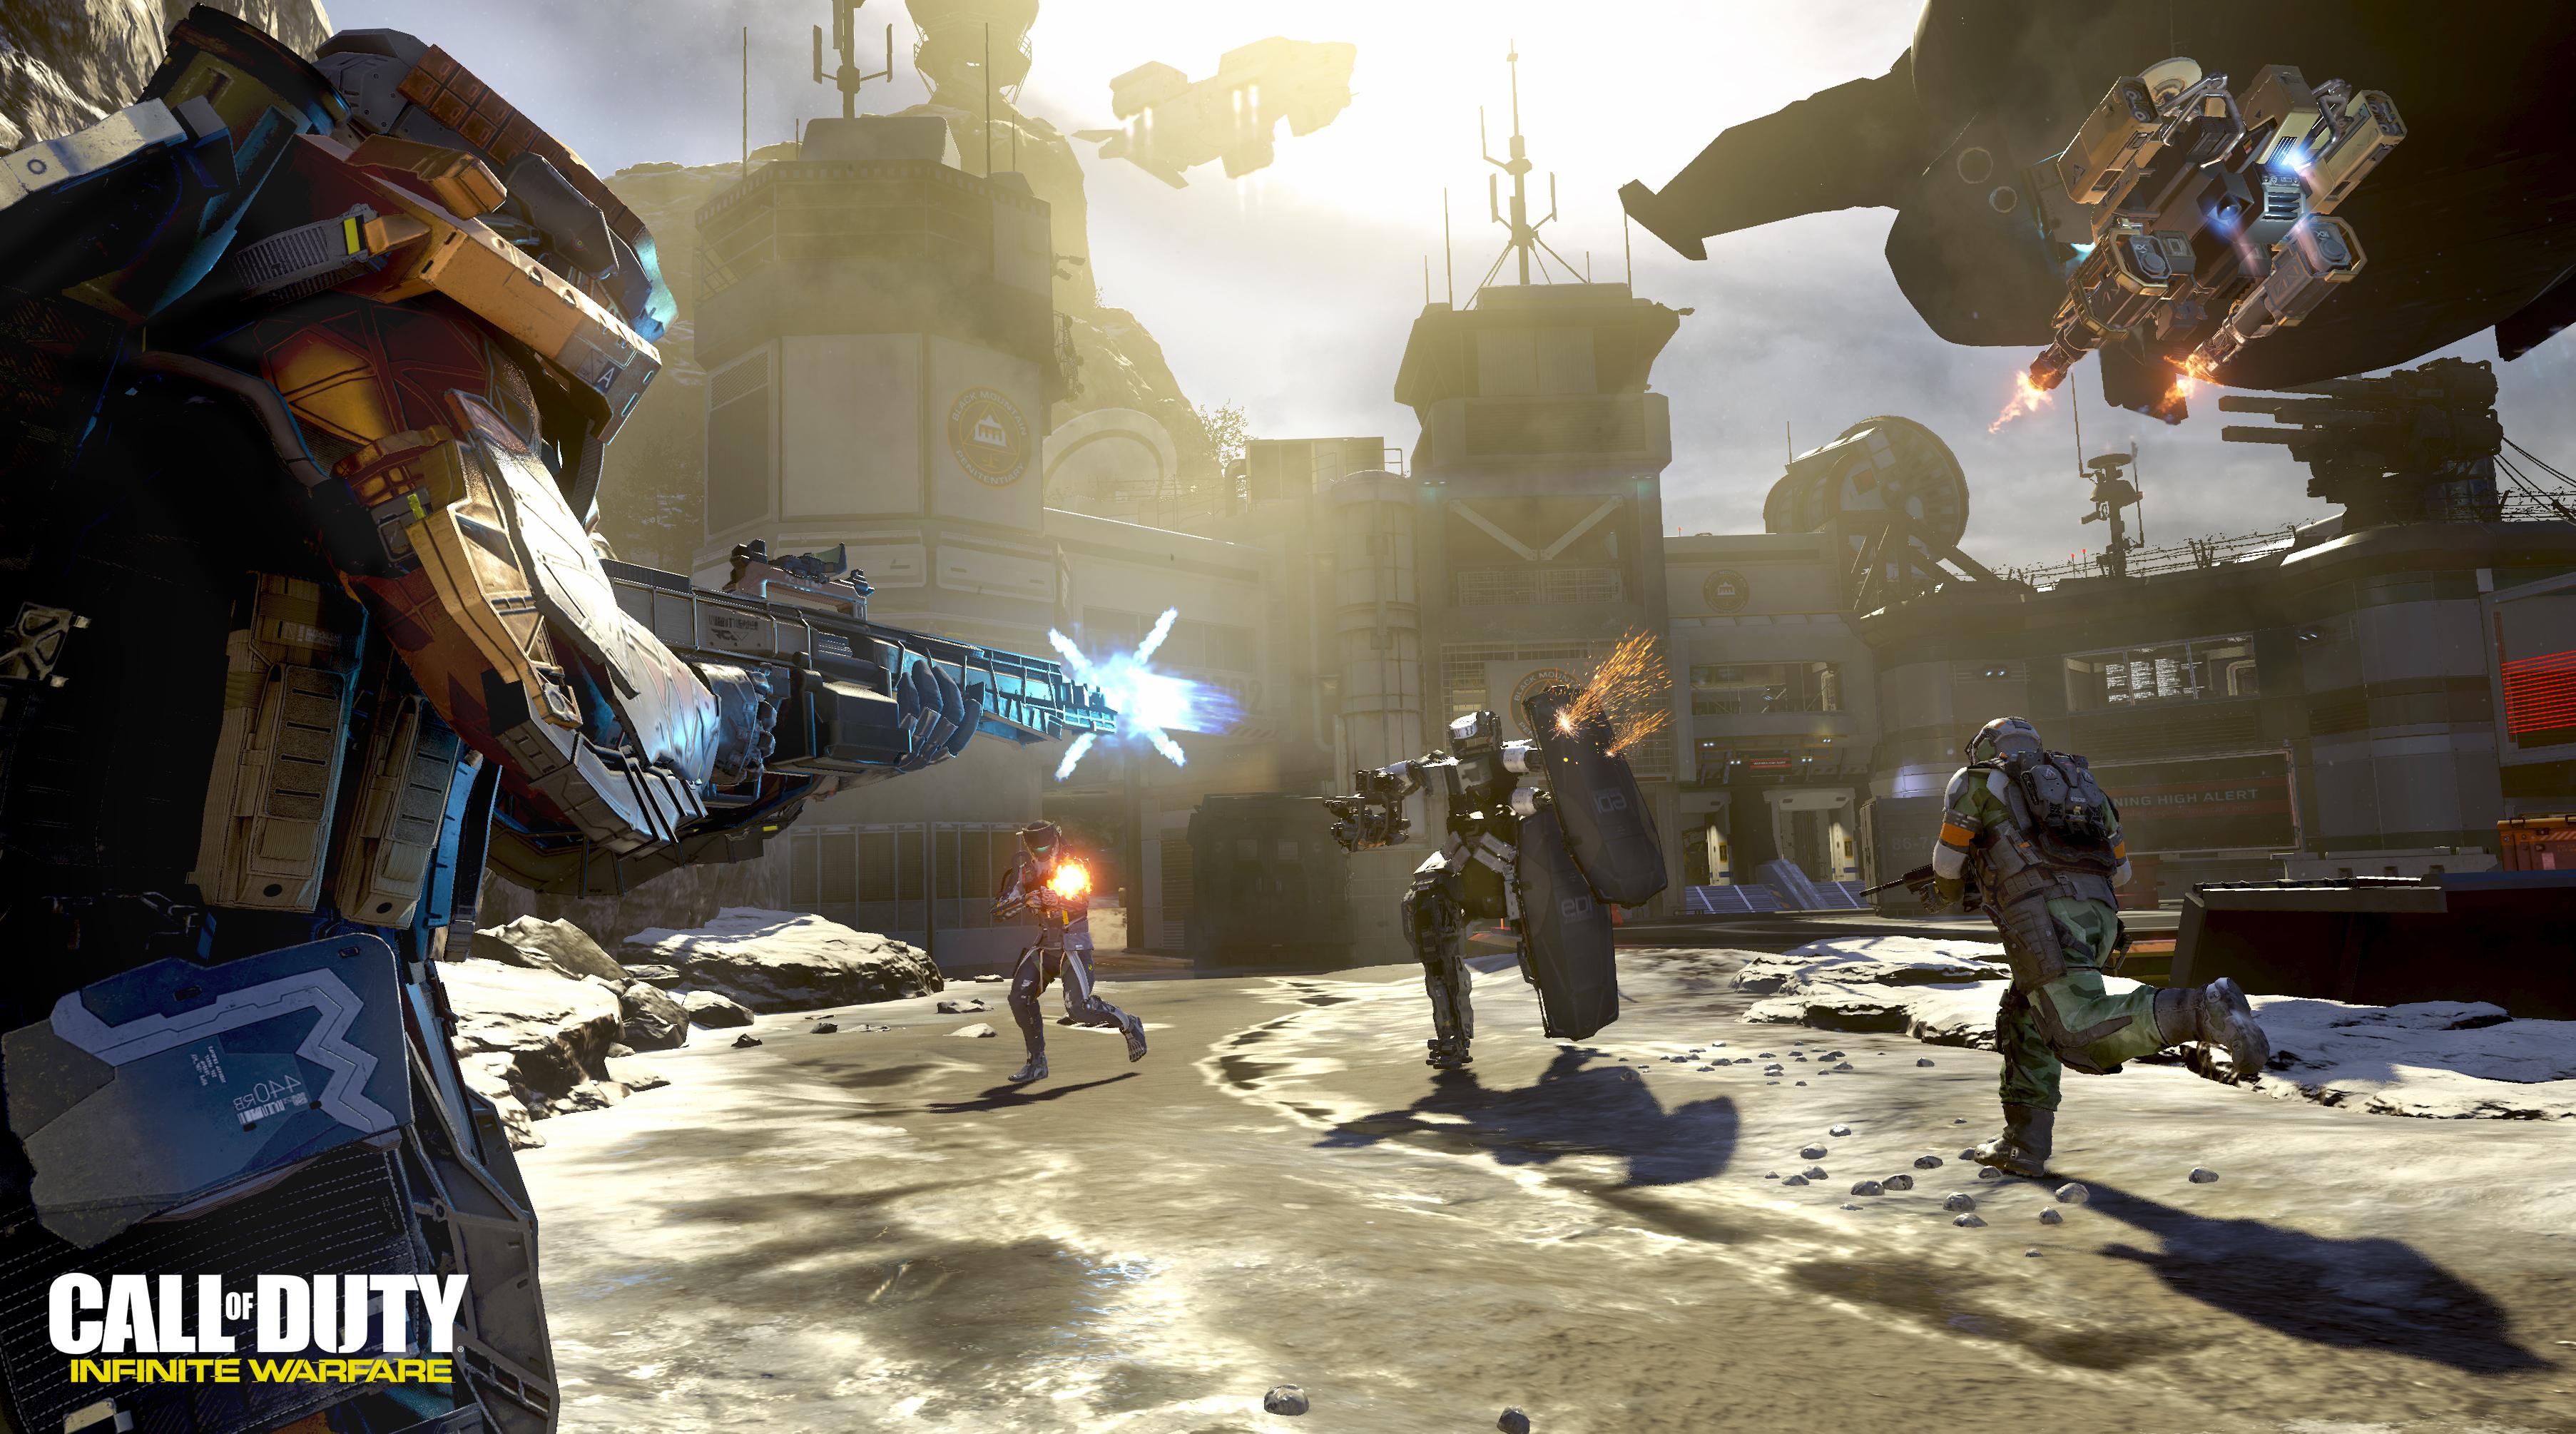 Call of Duty: Infinite Warfare multiplayer